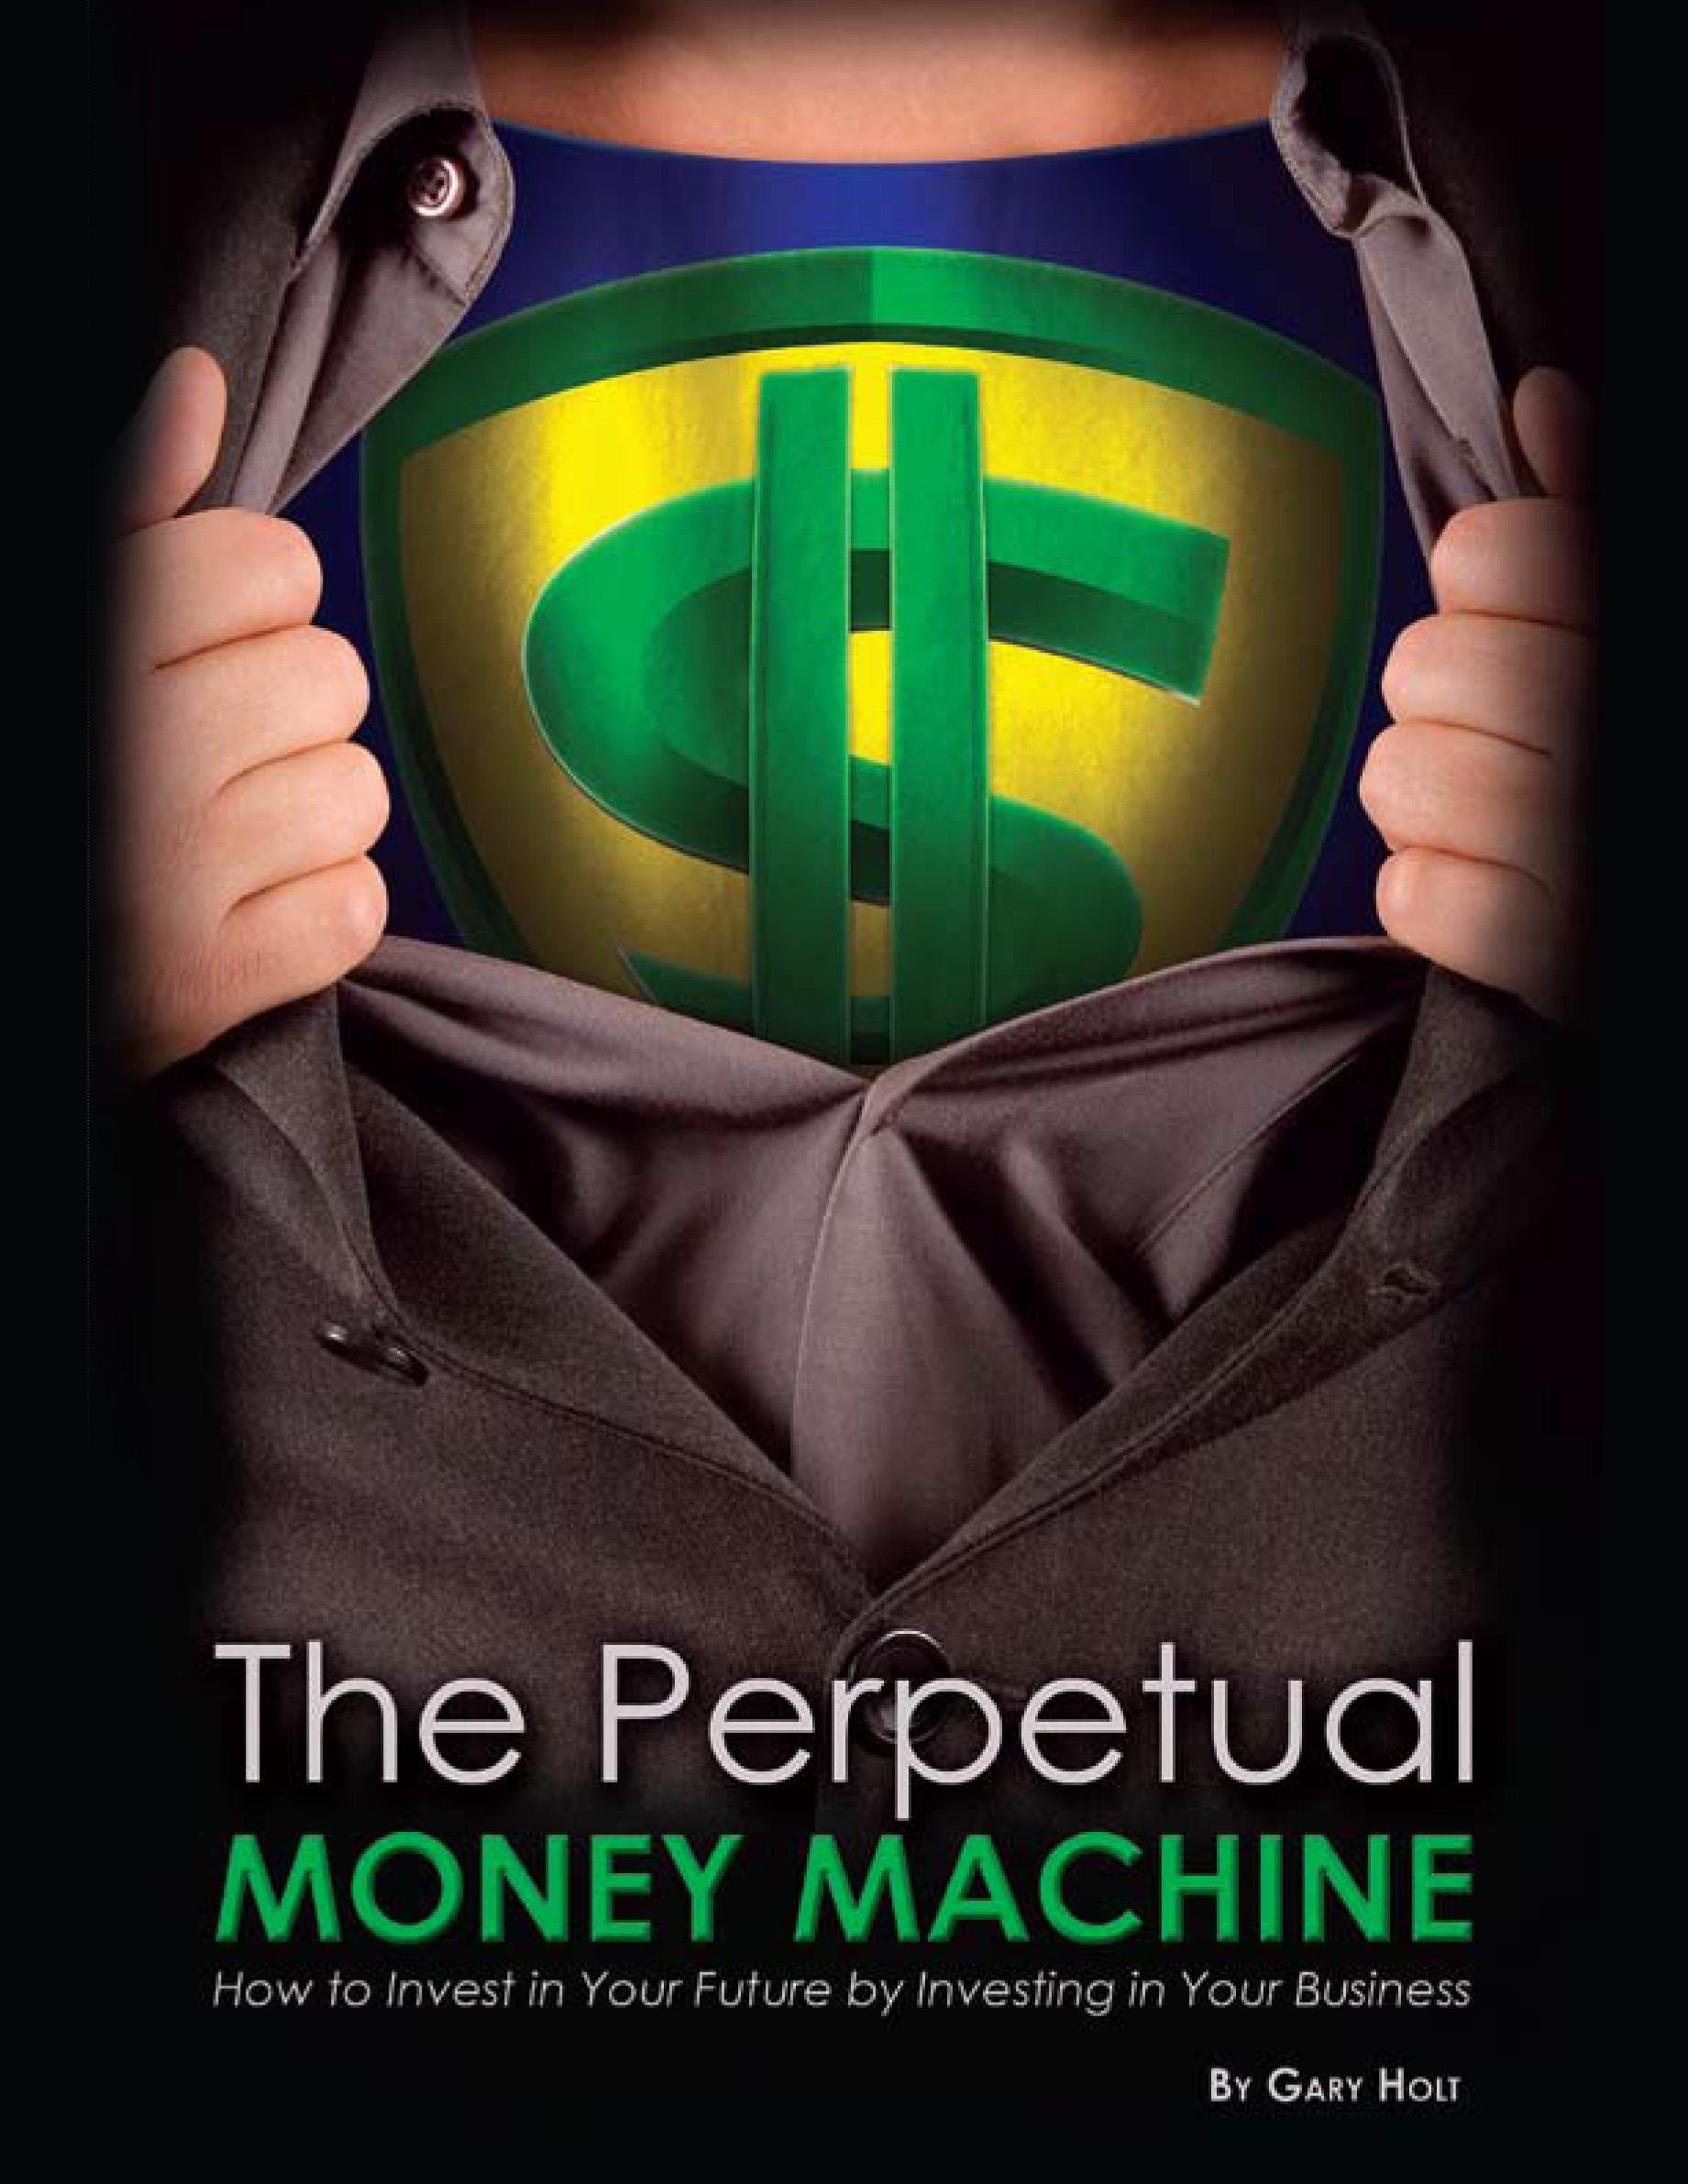 Perpetual Money Machine